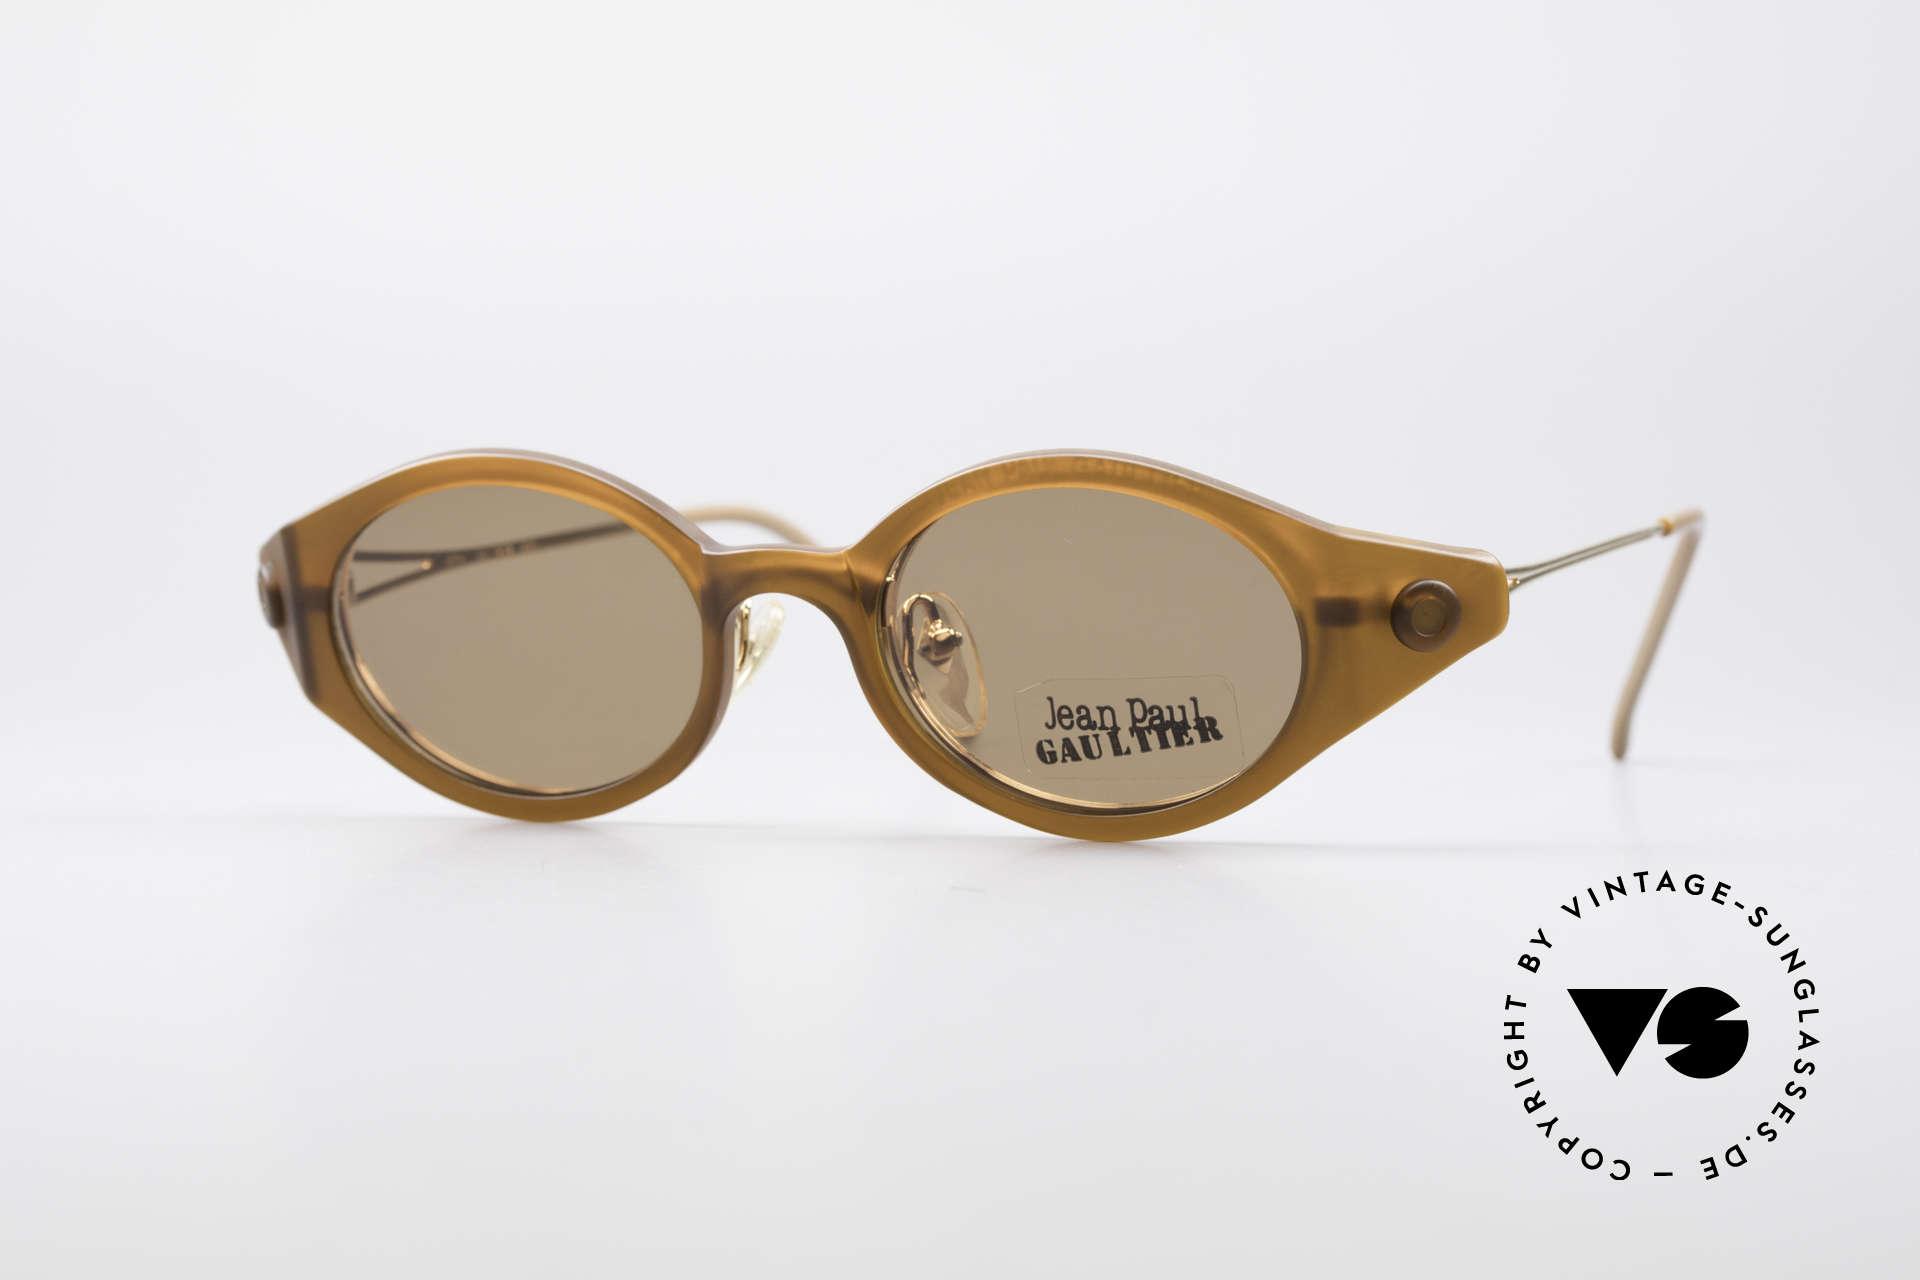 Jean Paul Gaultier 56-7202 Oval Frame With Sun Clip, orig. vintage Jean Paul Gaultier designer sunglasses, Made for Men and Women